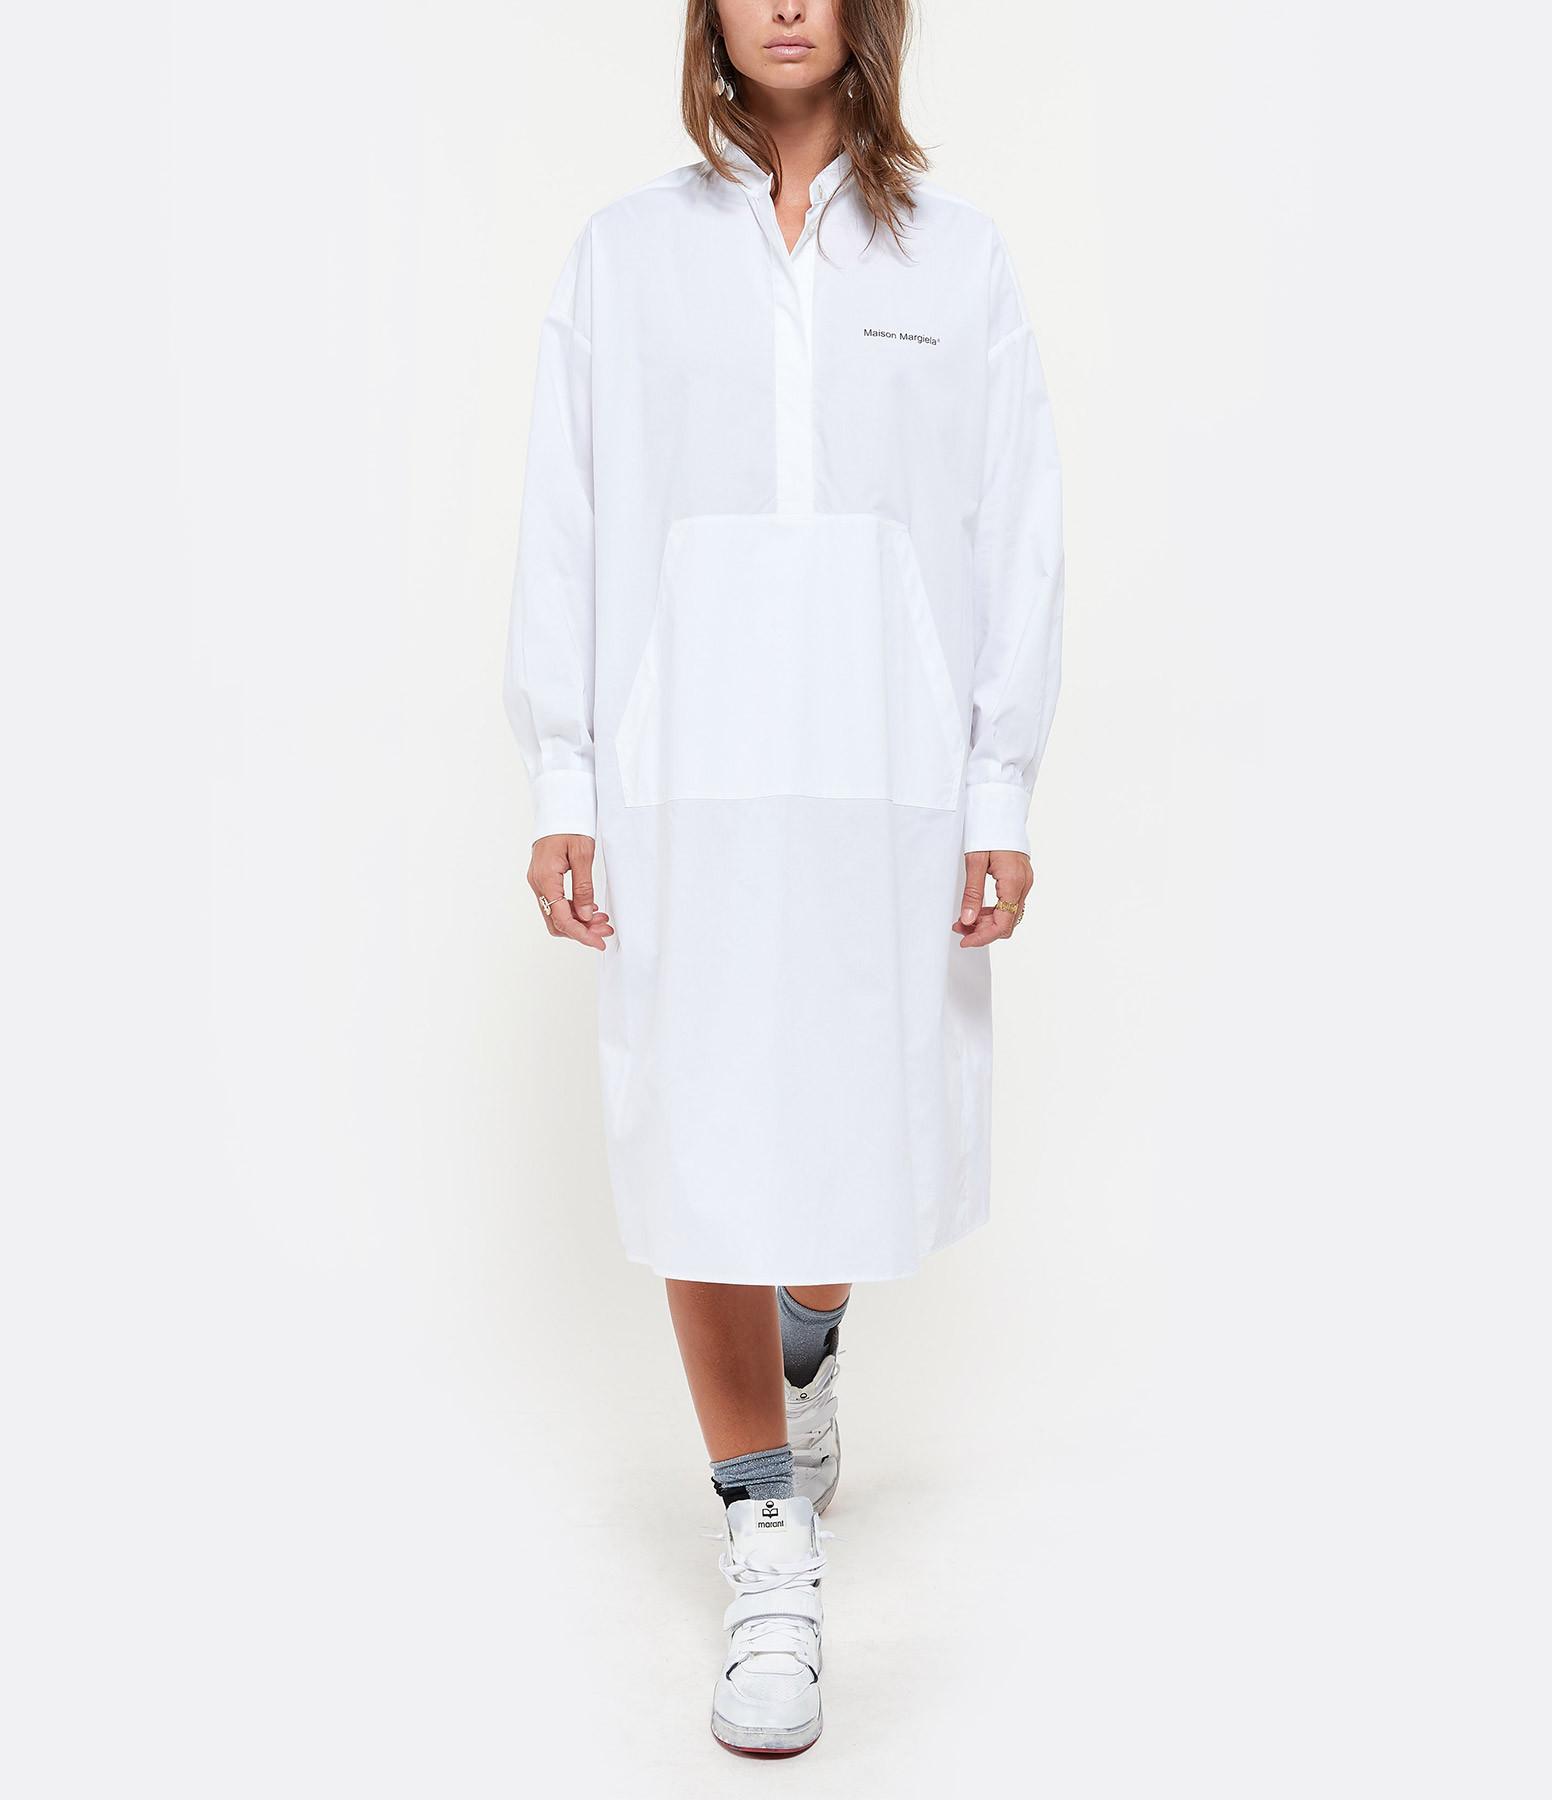 MM6 MAISON MARGIELA - Robe Popeline Parachute Blanc